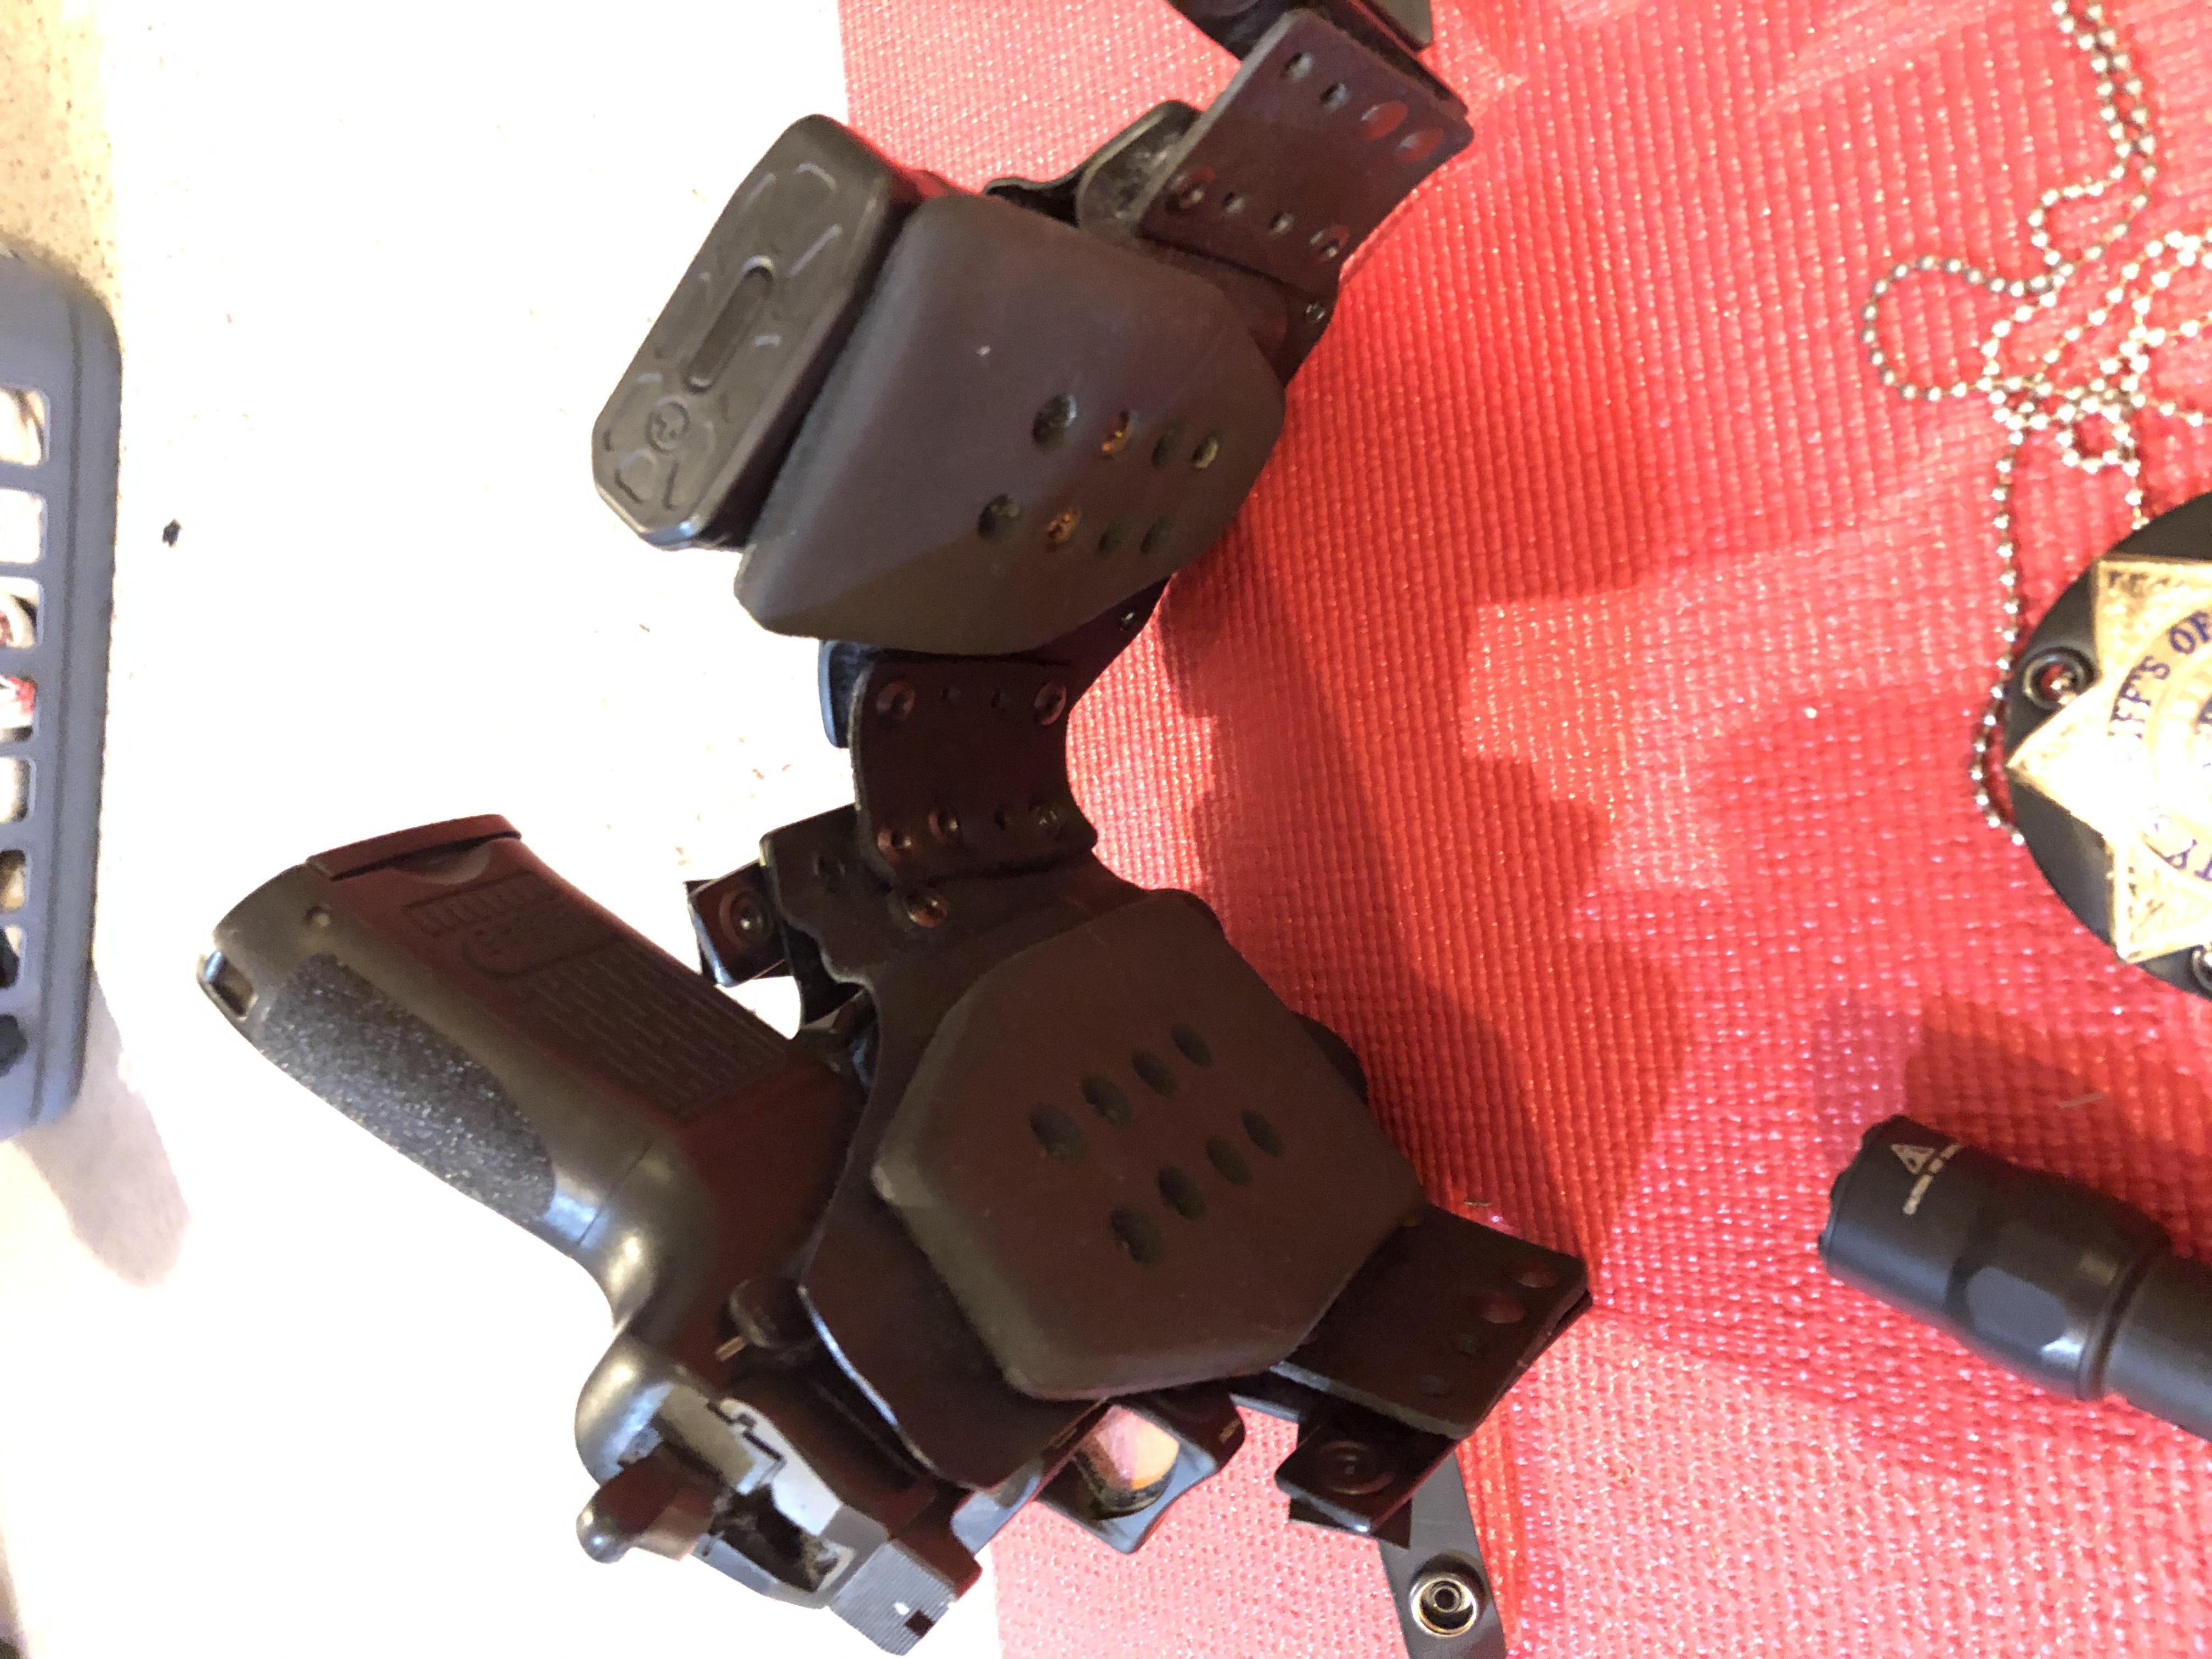 HK45C, APO/Red Dot (RMR20), TLR7, and Kaluban Cloak holster. UPDATE-e5210565-a91d-4de7-af20-98212039d4fe.jpeg